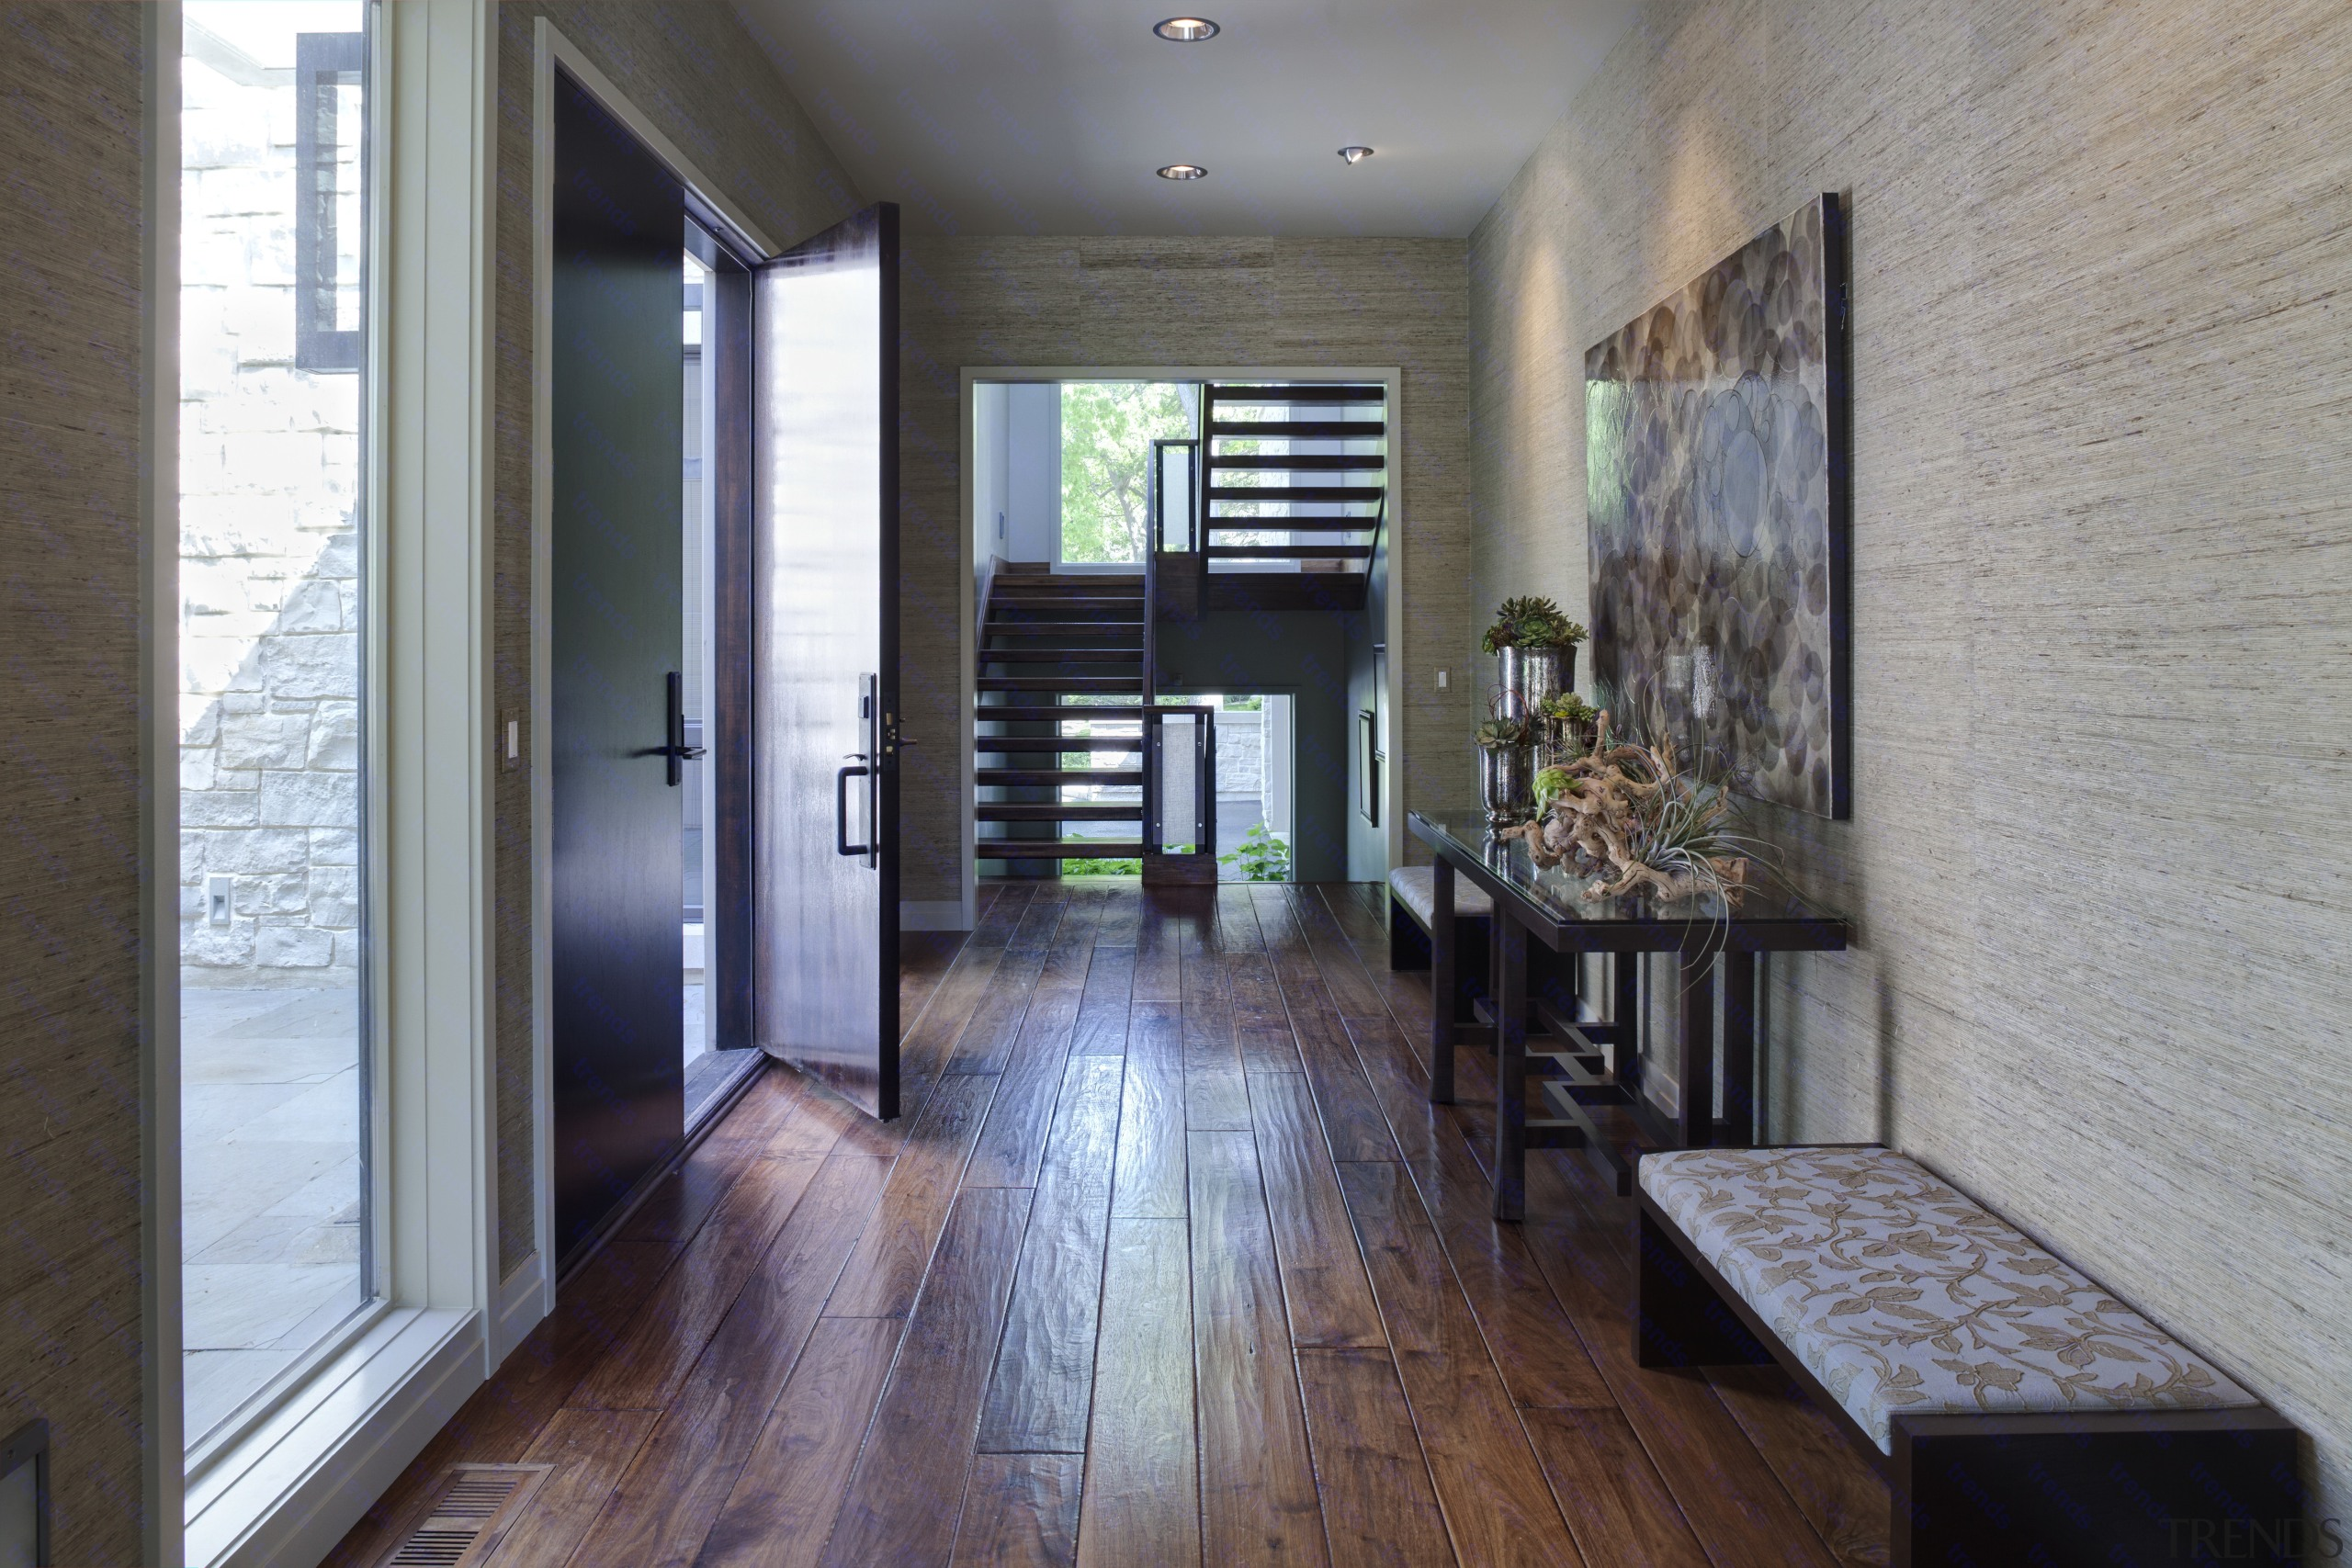 Greys and whites offset wooden floors and ceilings. floor, flooring, hardwood, house, interior design, wood, wood flooring, gray, black